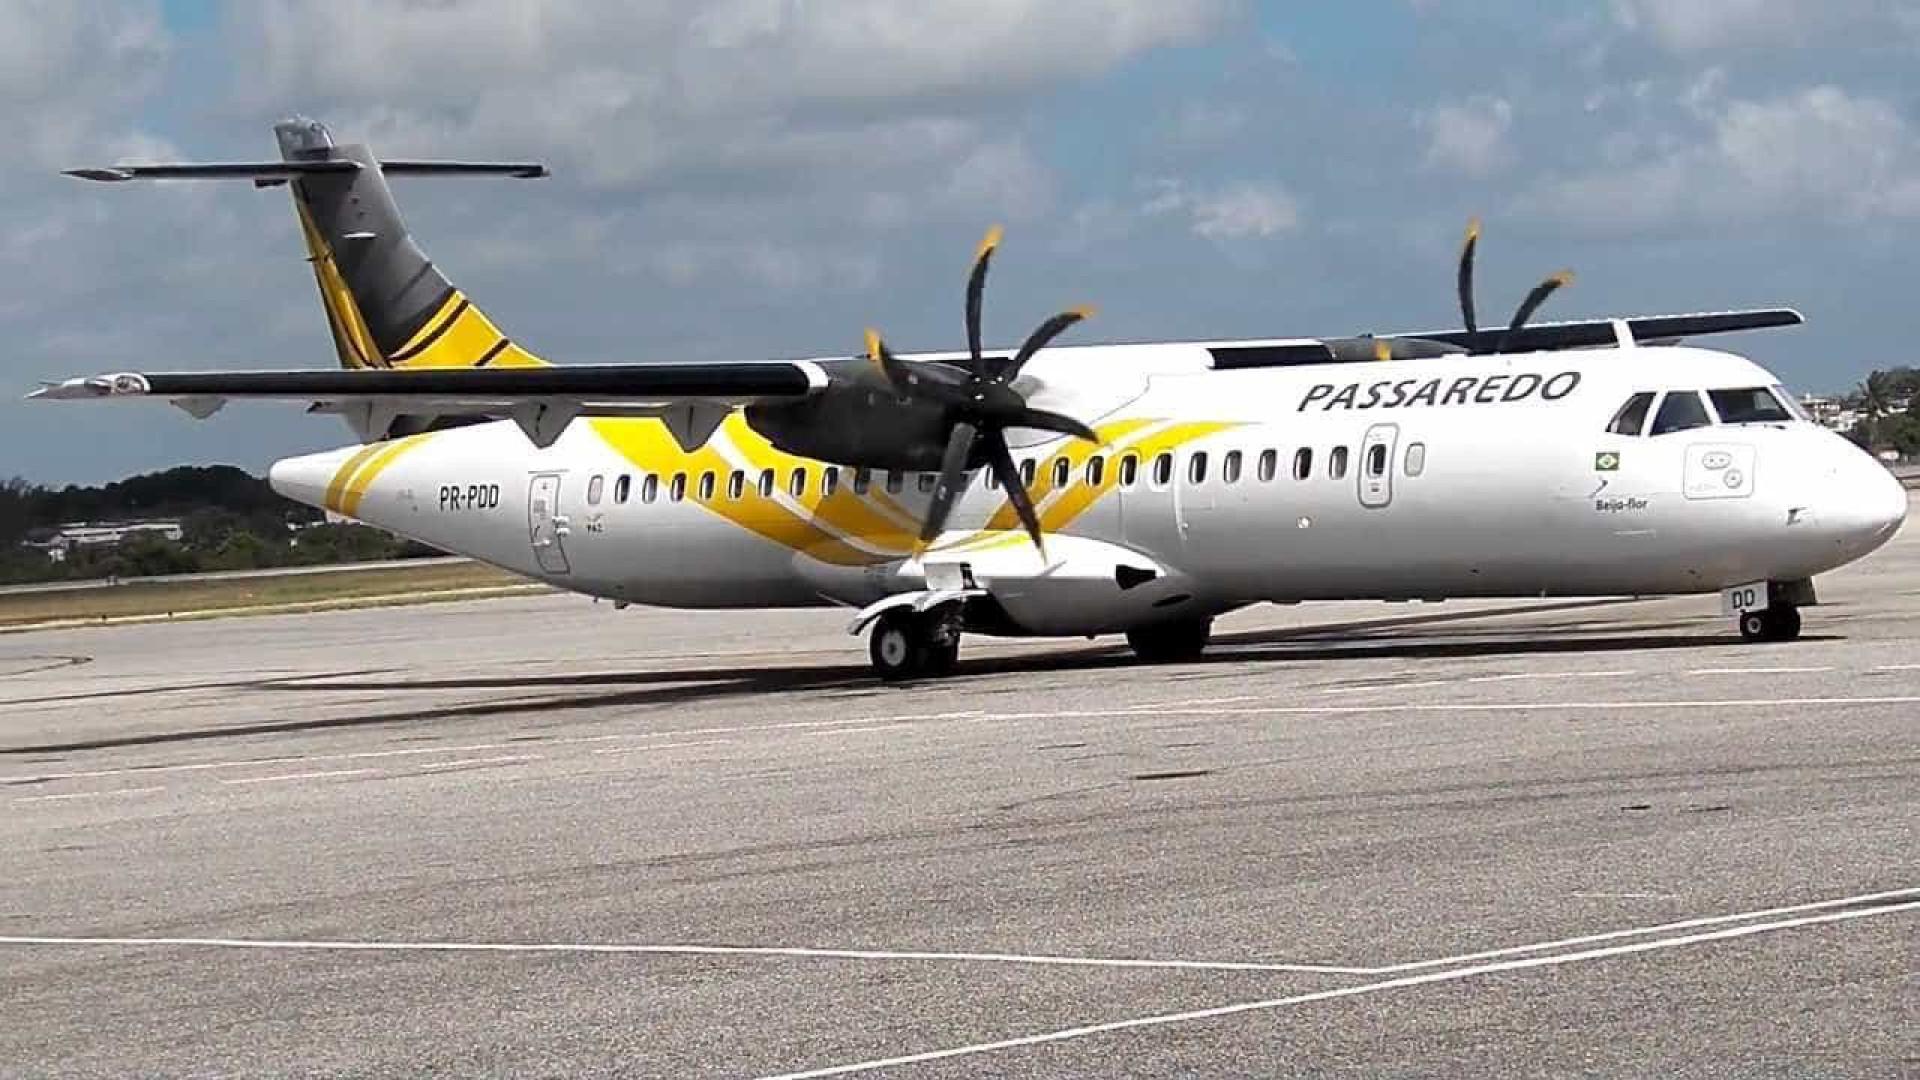 Itapemirim começa a receber aeronaves para voos comerciais após Anac autorizar